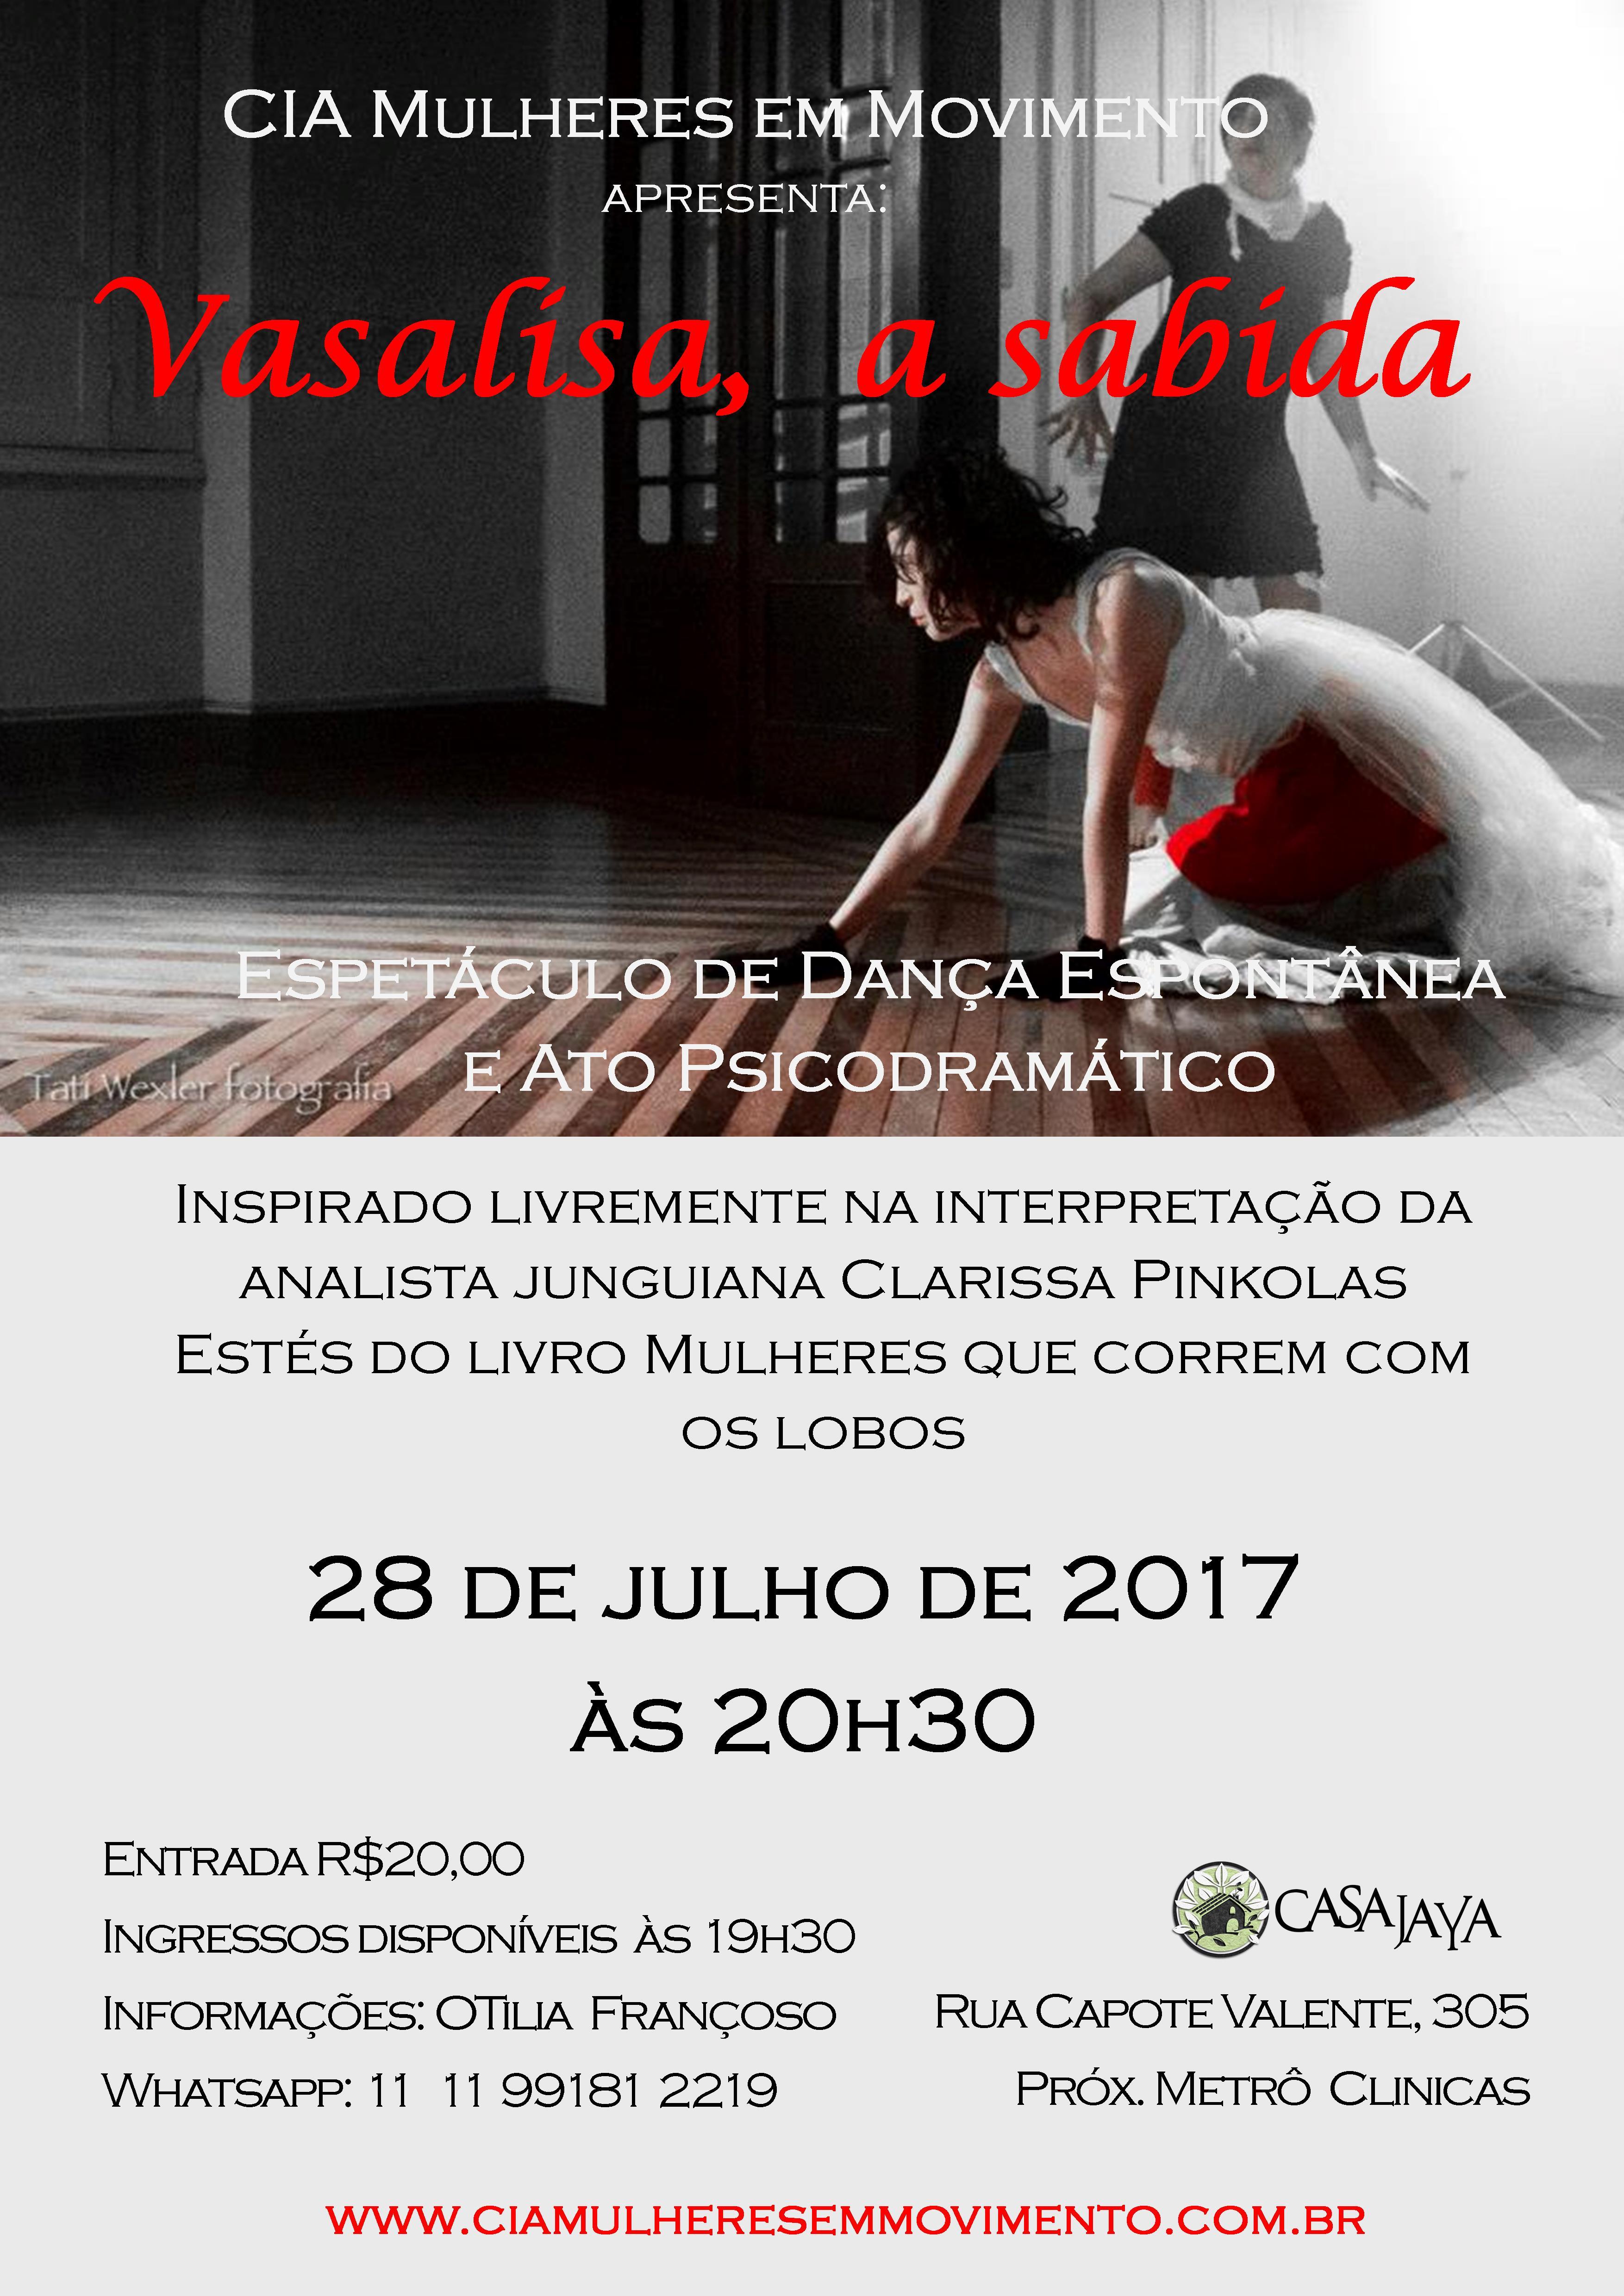 2017-07  Vasalisa Casa Jaya